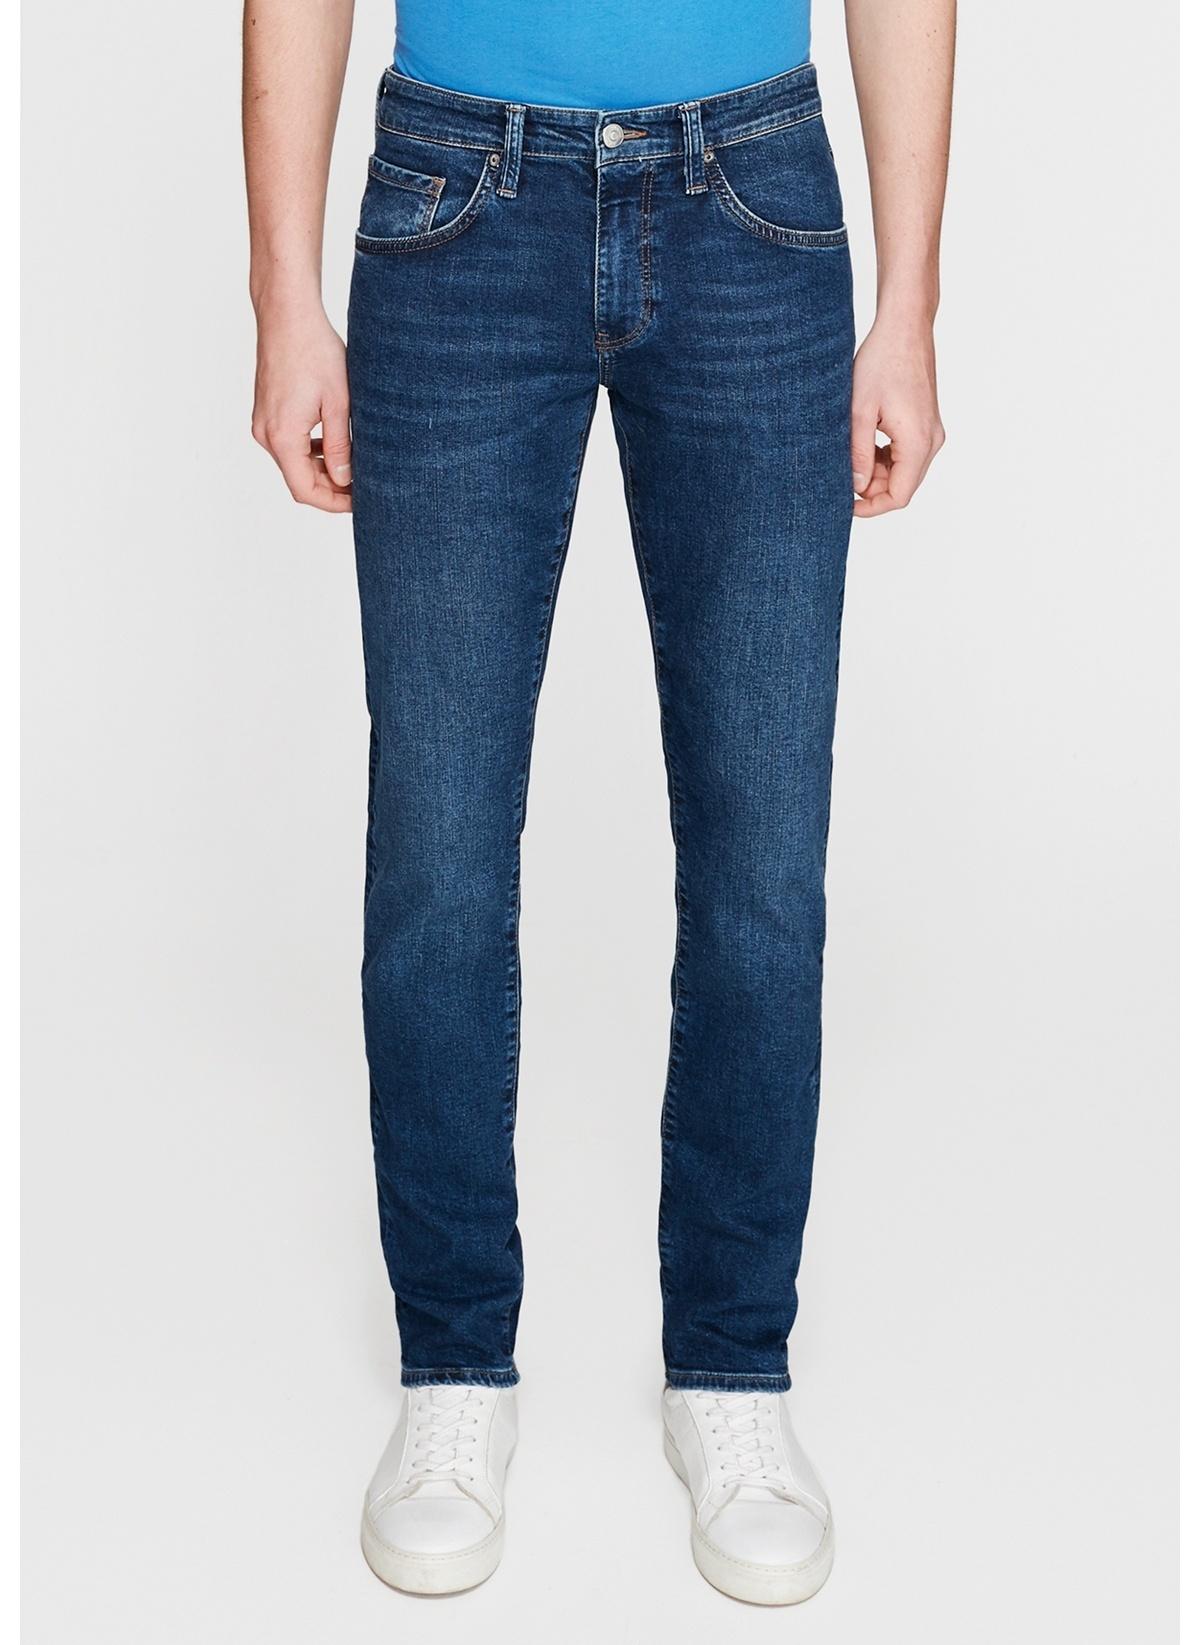 Mavi Jean Pantolon   Jake – Skinny 0042229575 Jake 90's Comfort Jean Pantol – 159.99 TL